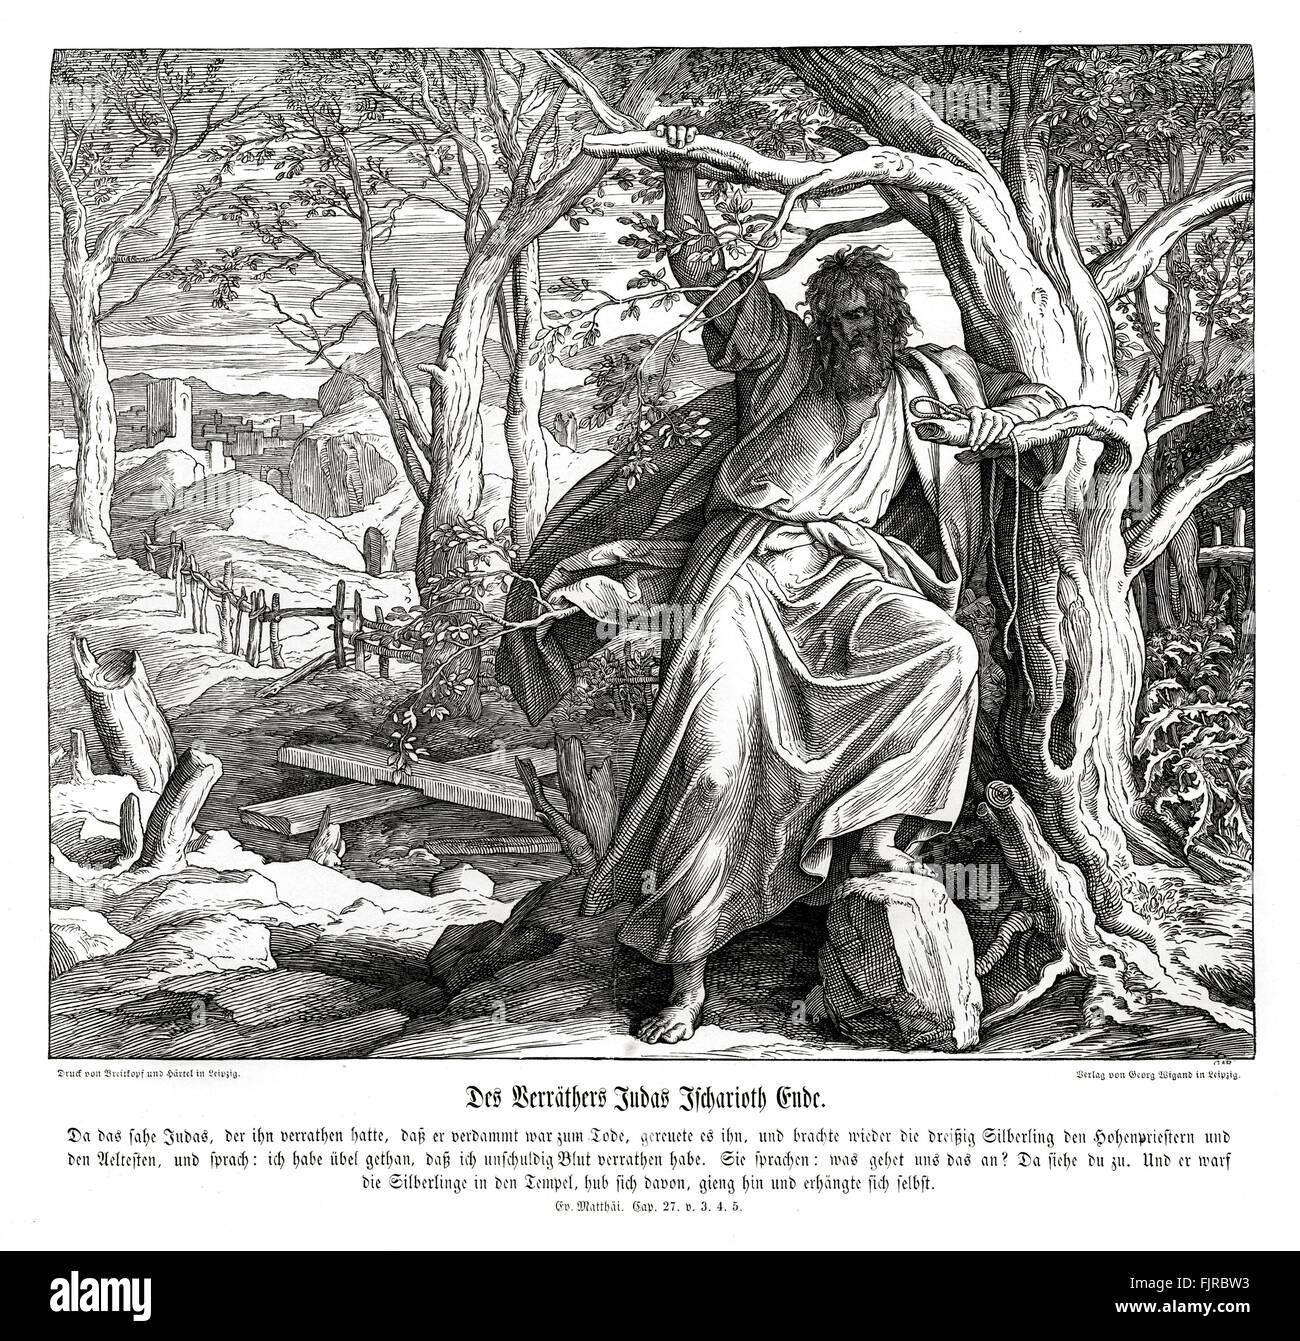 Death of Judas Iscariot, Gospel of Matthew chapter XXVII verses 3 - 5 'Then Judas, which had betrayed him, when - Stock Image